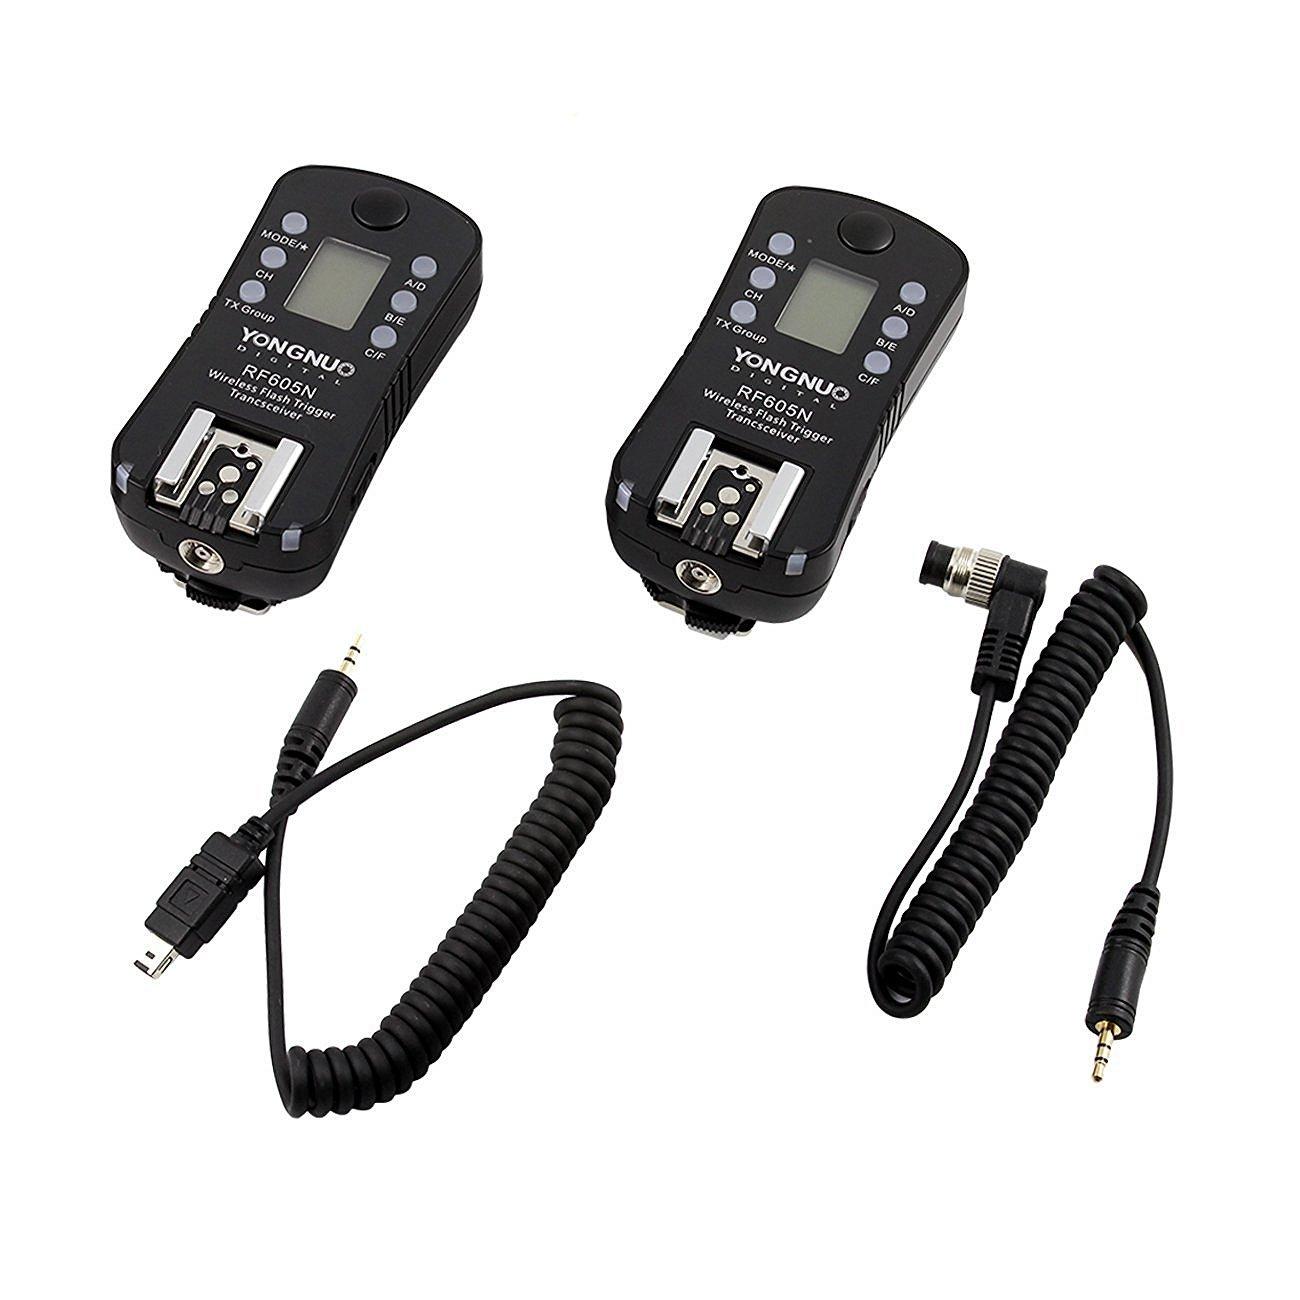 YONGNUO RF-605 N3 Flash Trigger/Wireless Remote Shutter Release Transceiver Kit for Nikon DSLR D750 D3100 D3200 D5300 D7200 D90 D5000 D7000 D7100 D5100 D600 by Yongnuo